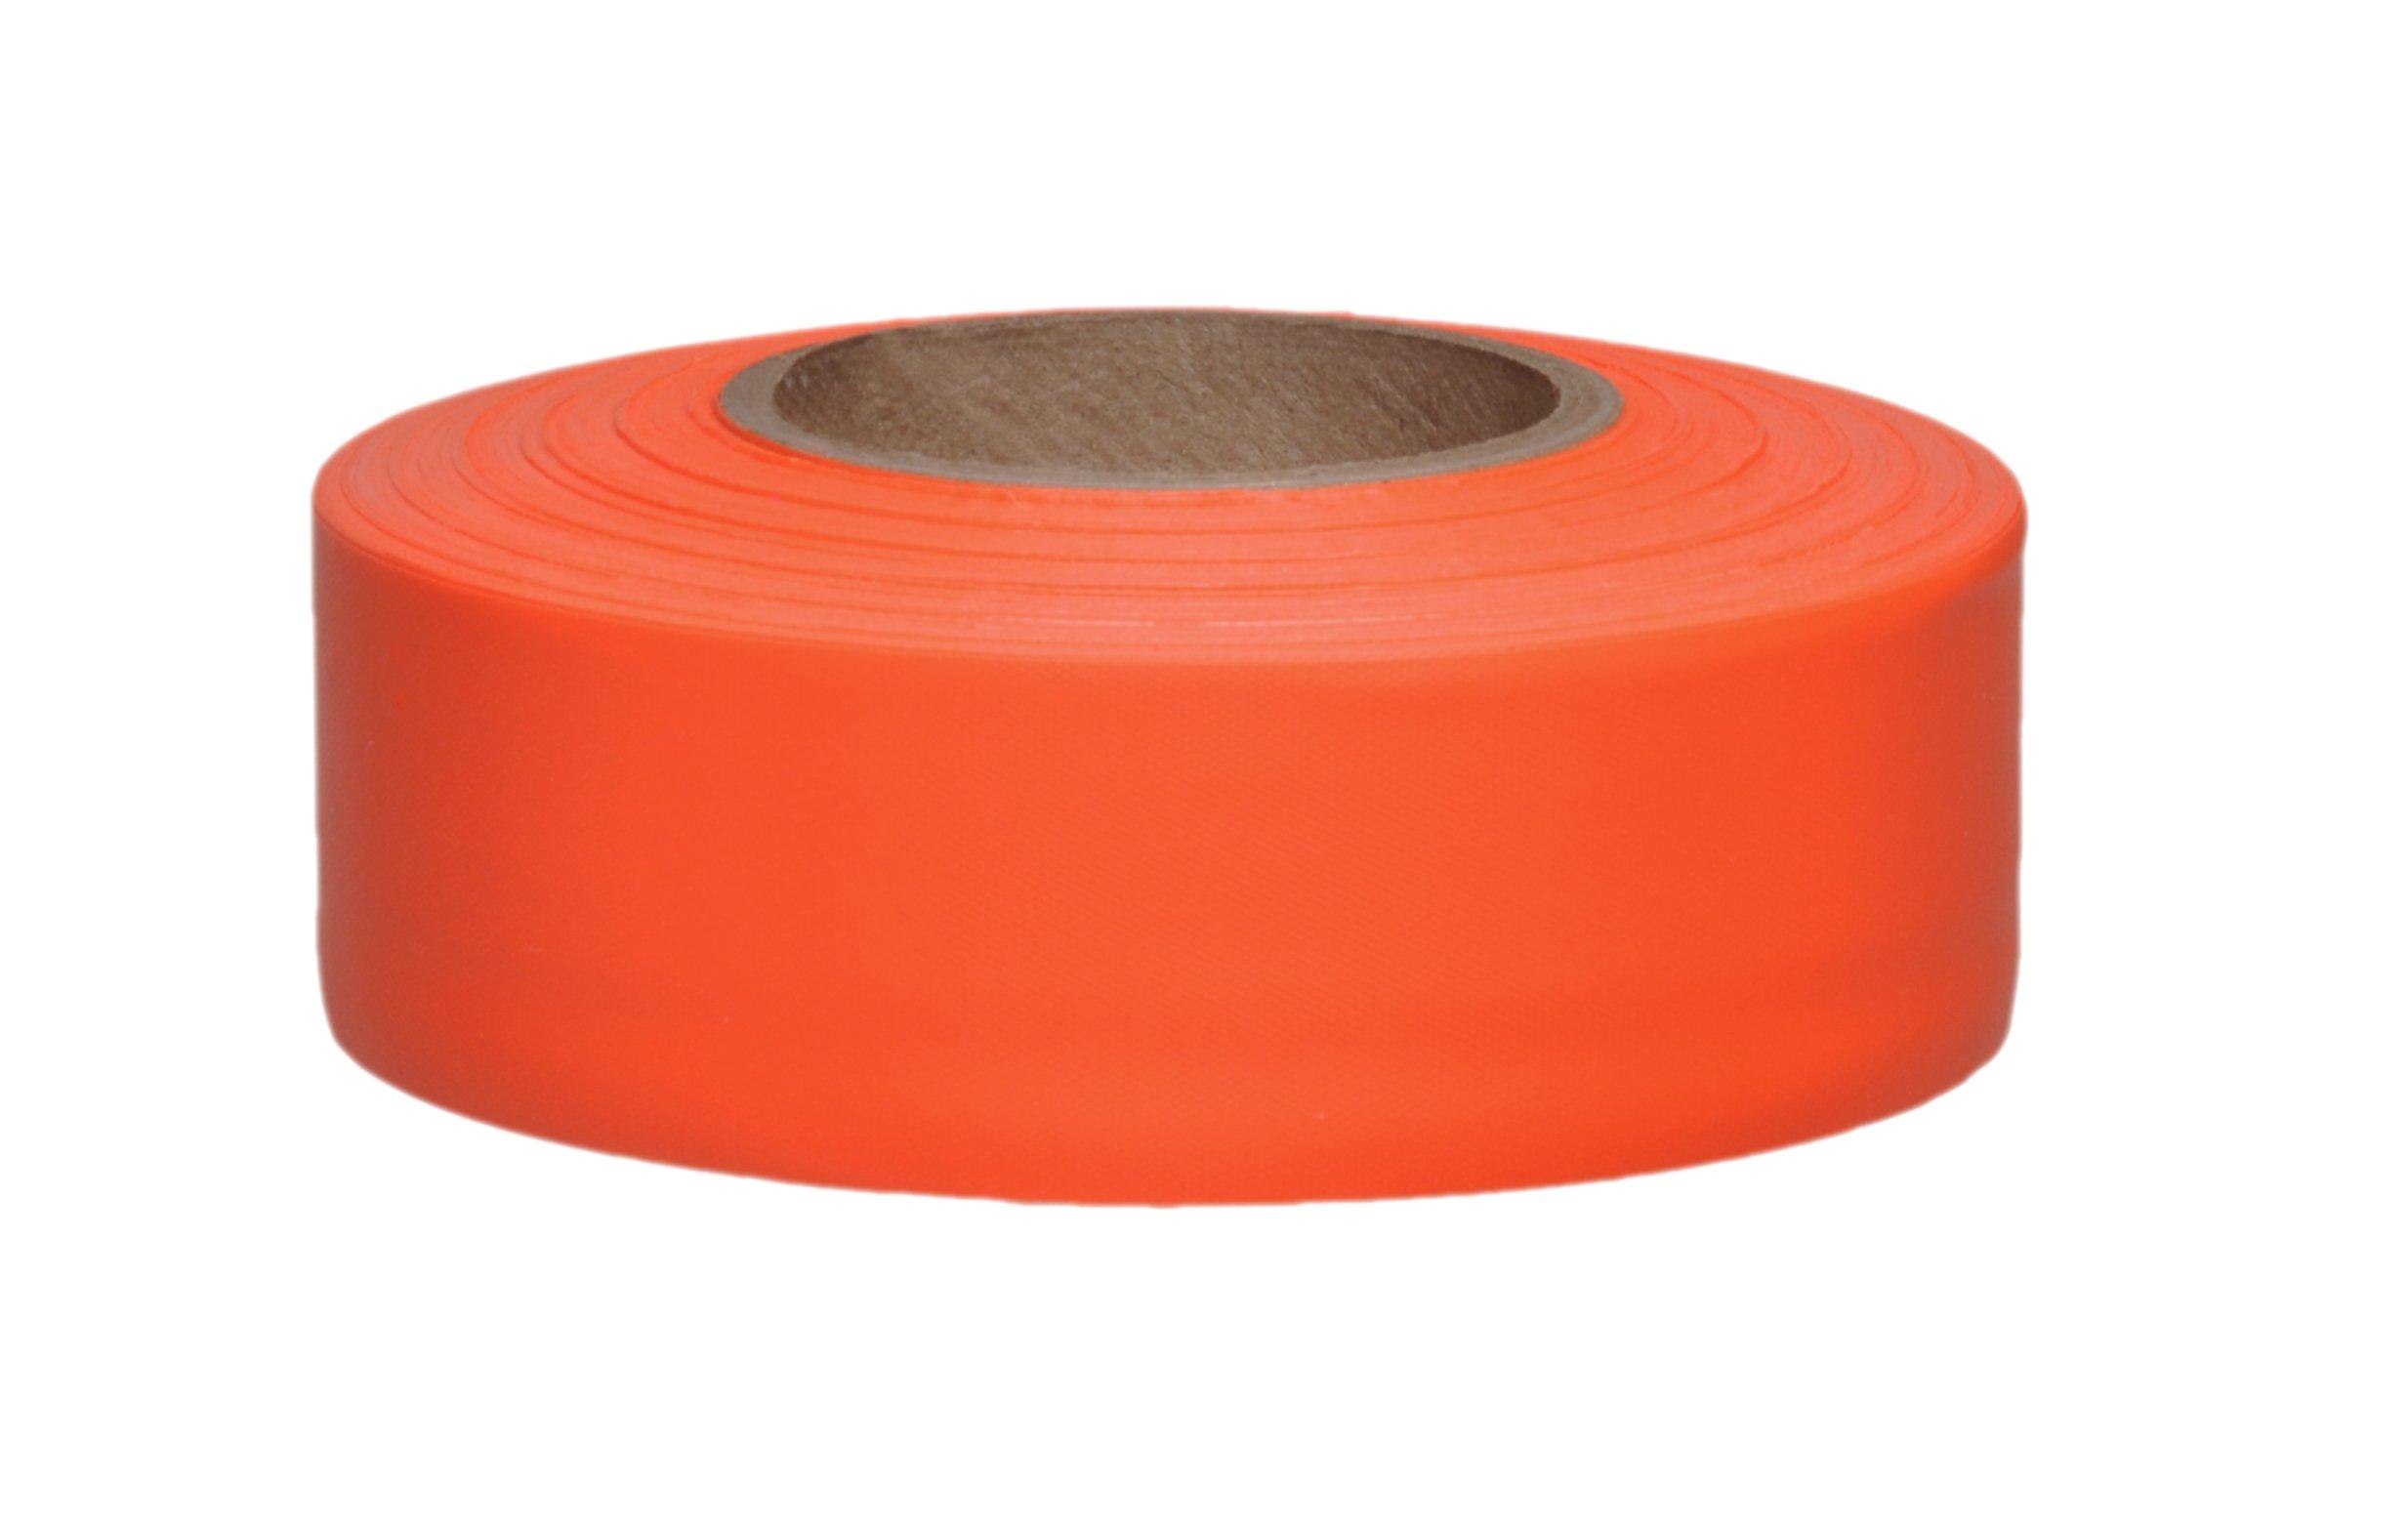 Presco TF1OG-658 150' Length x 1'' Width, PVC Film, Taffeta Orange Glo Solid Color Roll Flagging (Pack of 100)